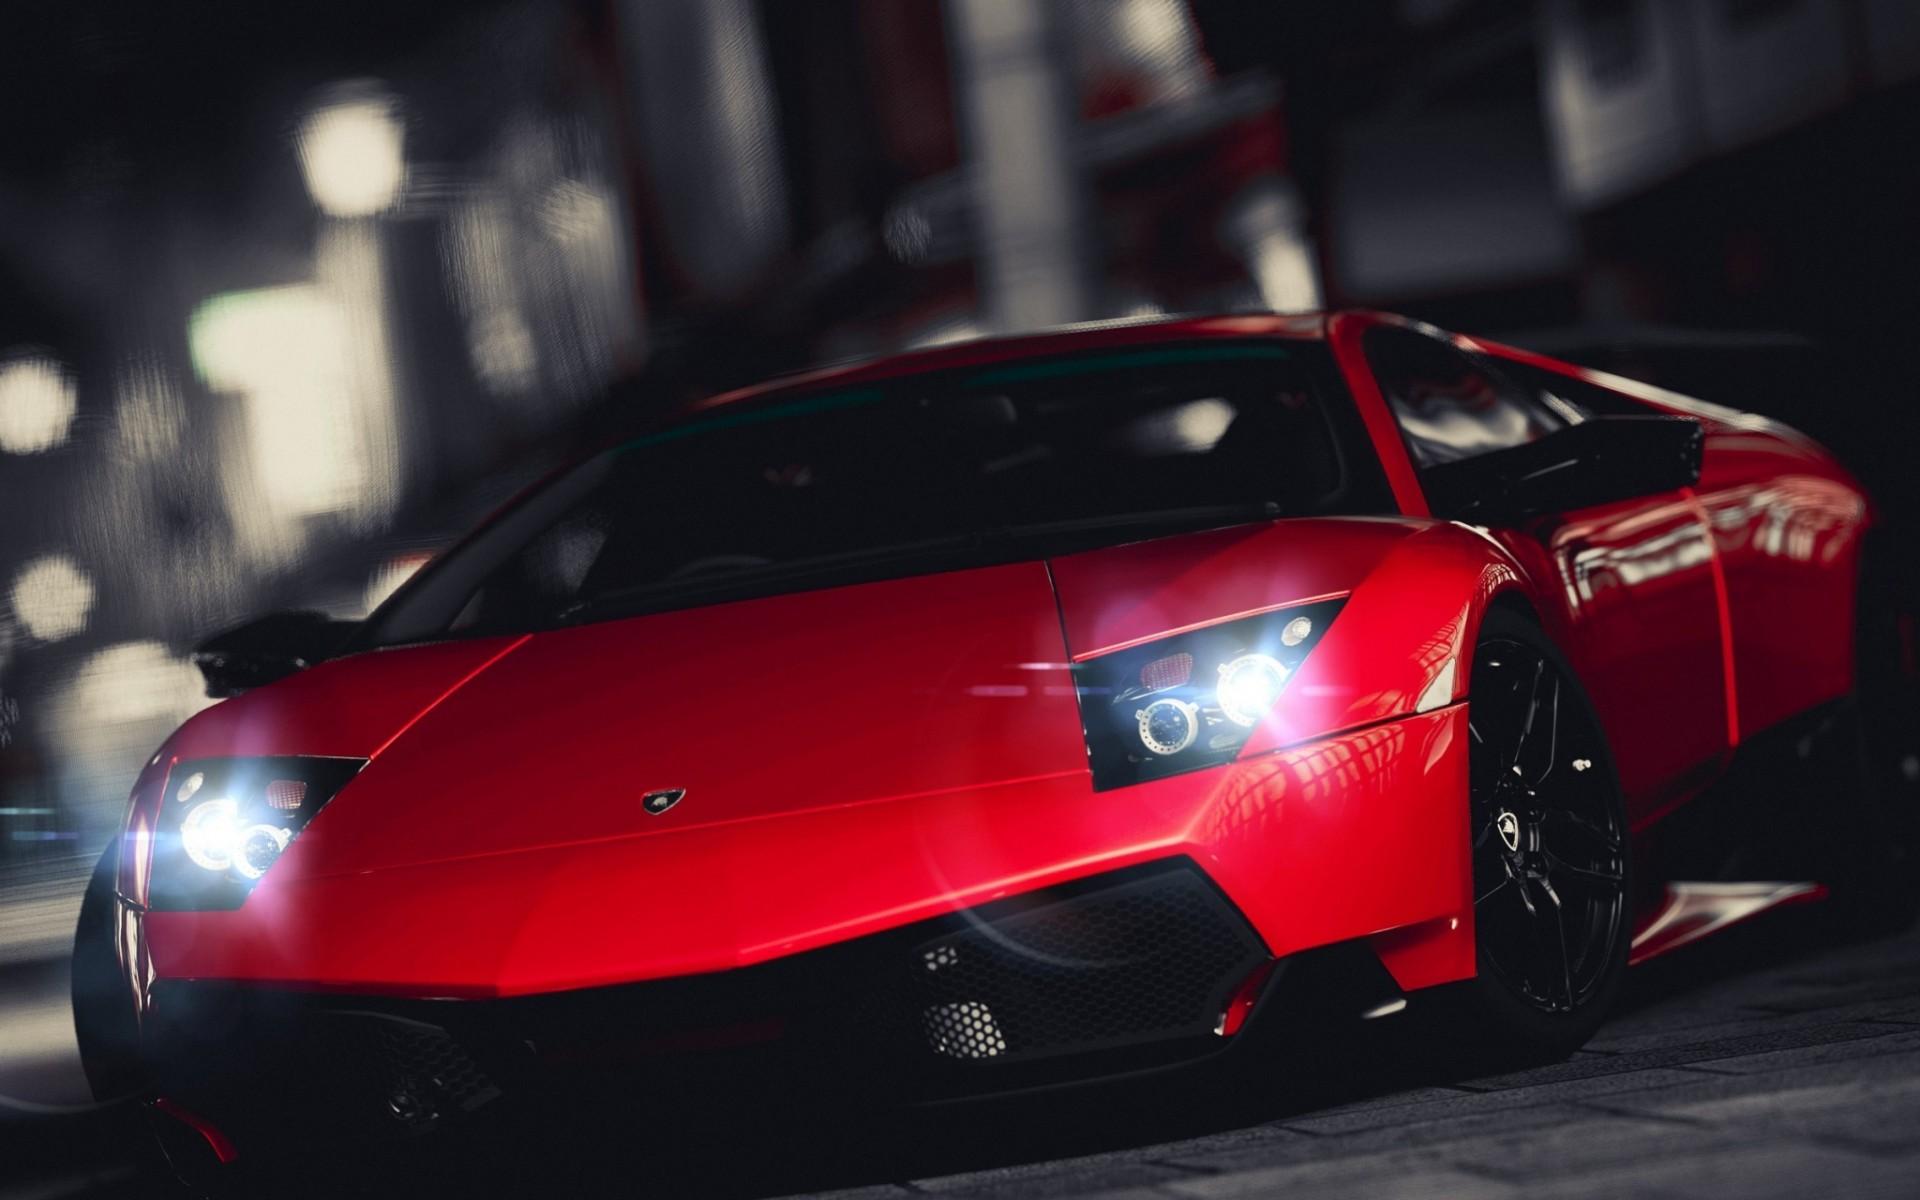 Lamborghini Murciélago Wallpapers, Pictures, Images